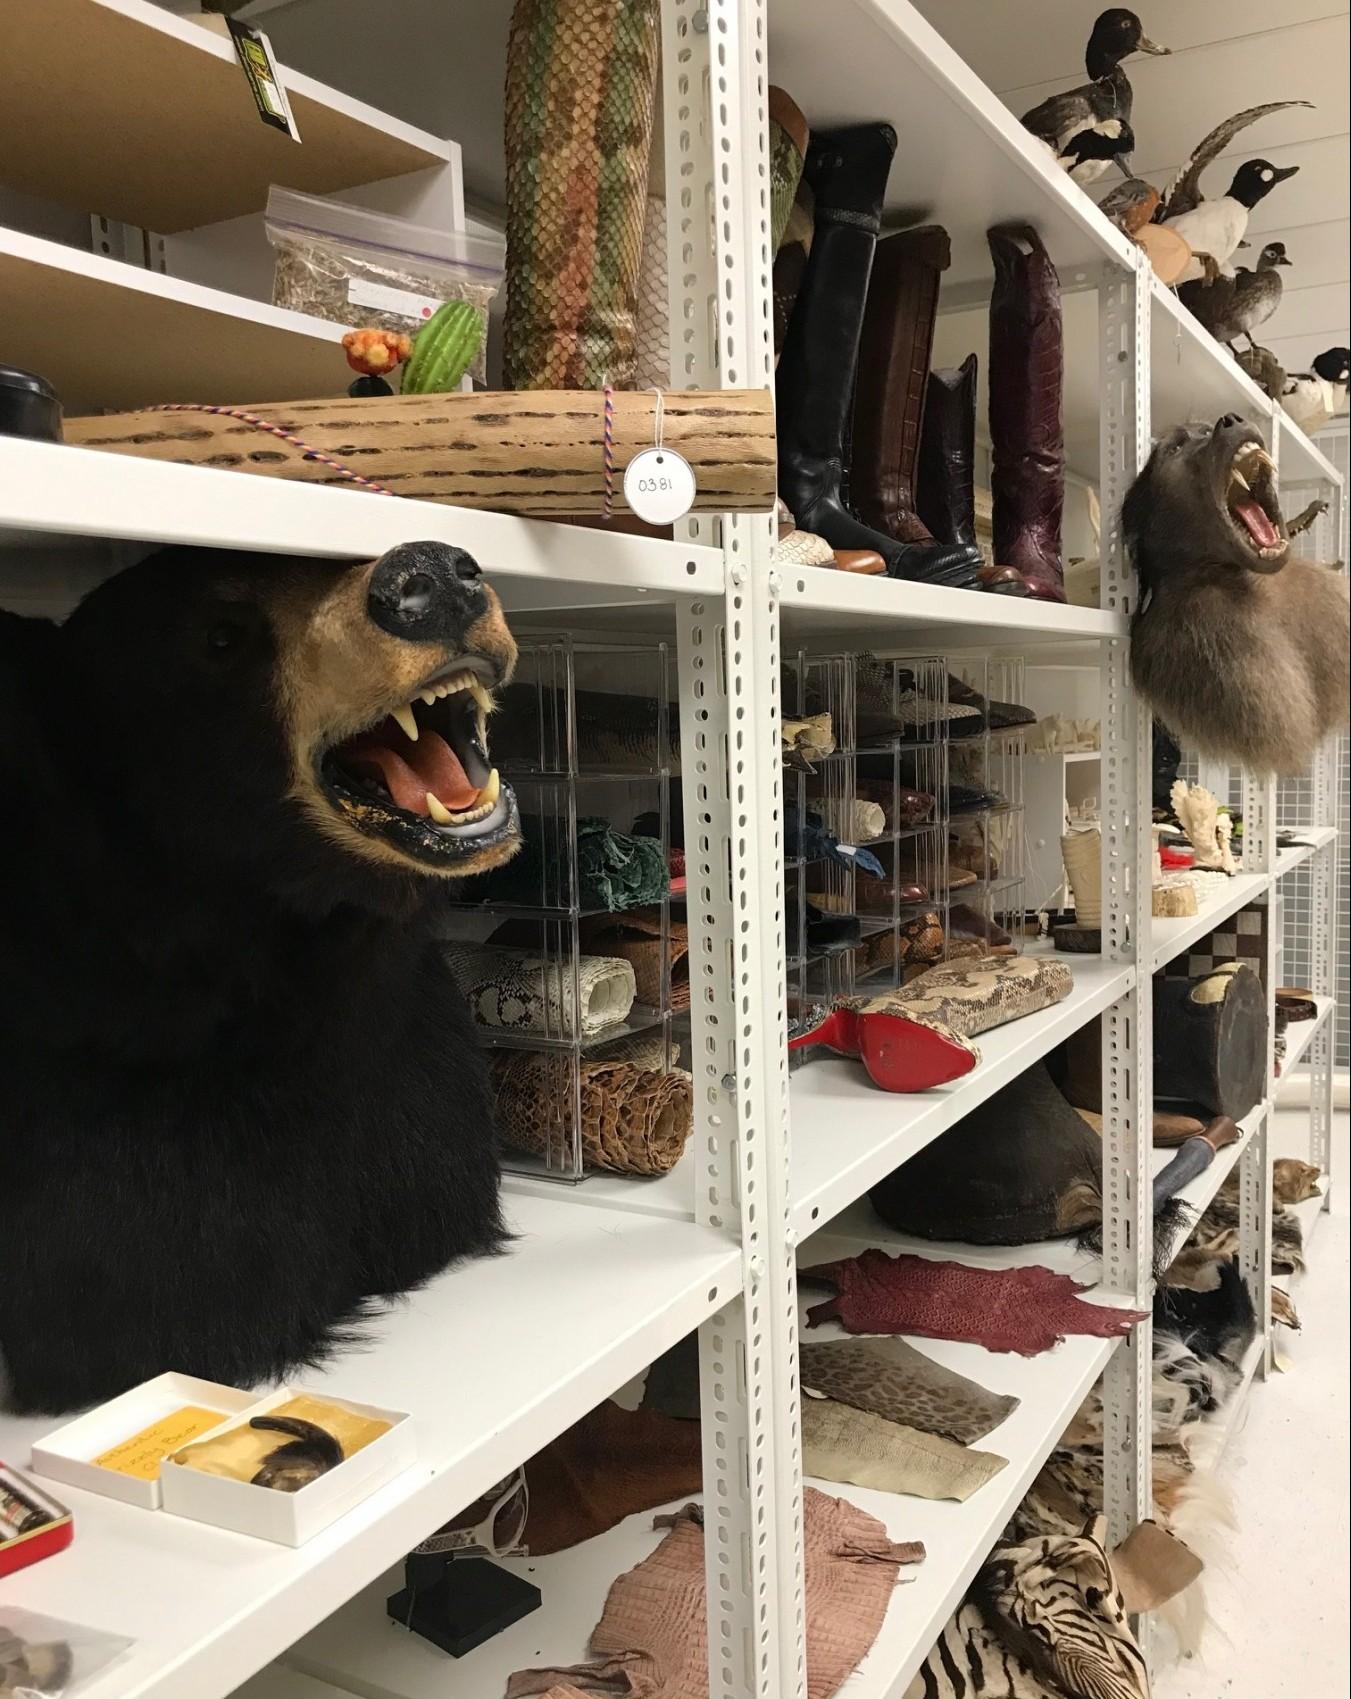 Pictured: Canada border services wildlife locker